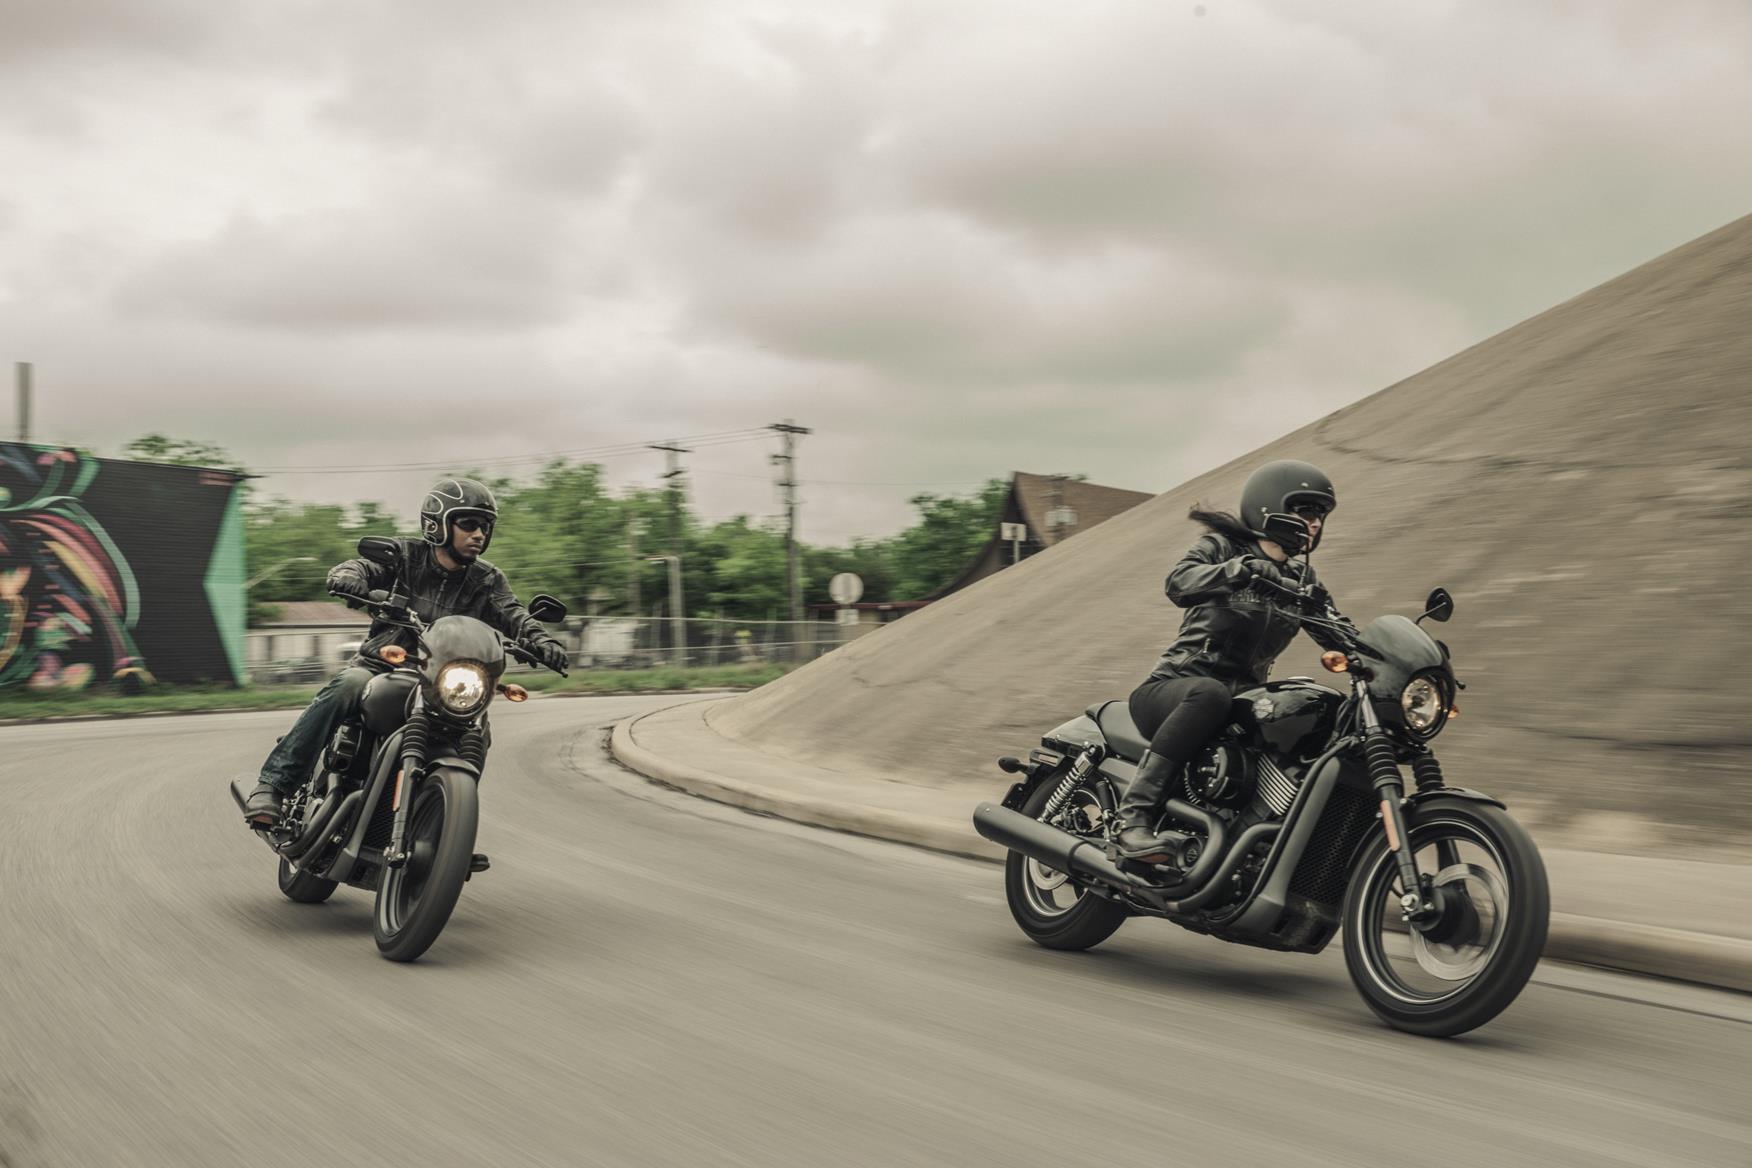 Harley Davidson: Harley-Davidson Street 750 First Ride Incoming